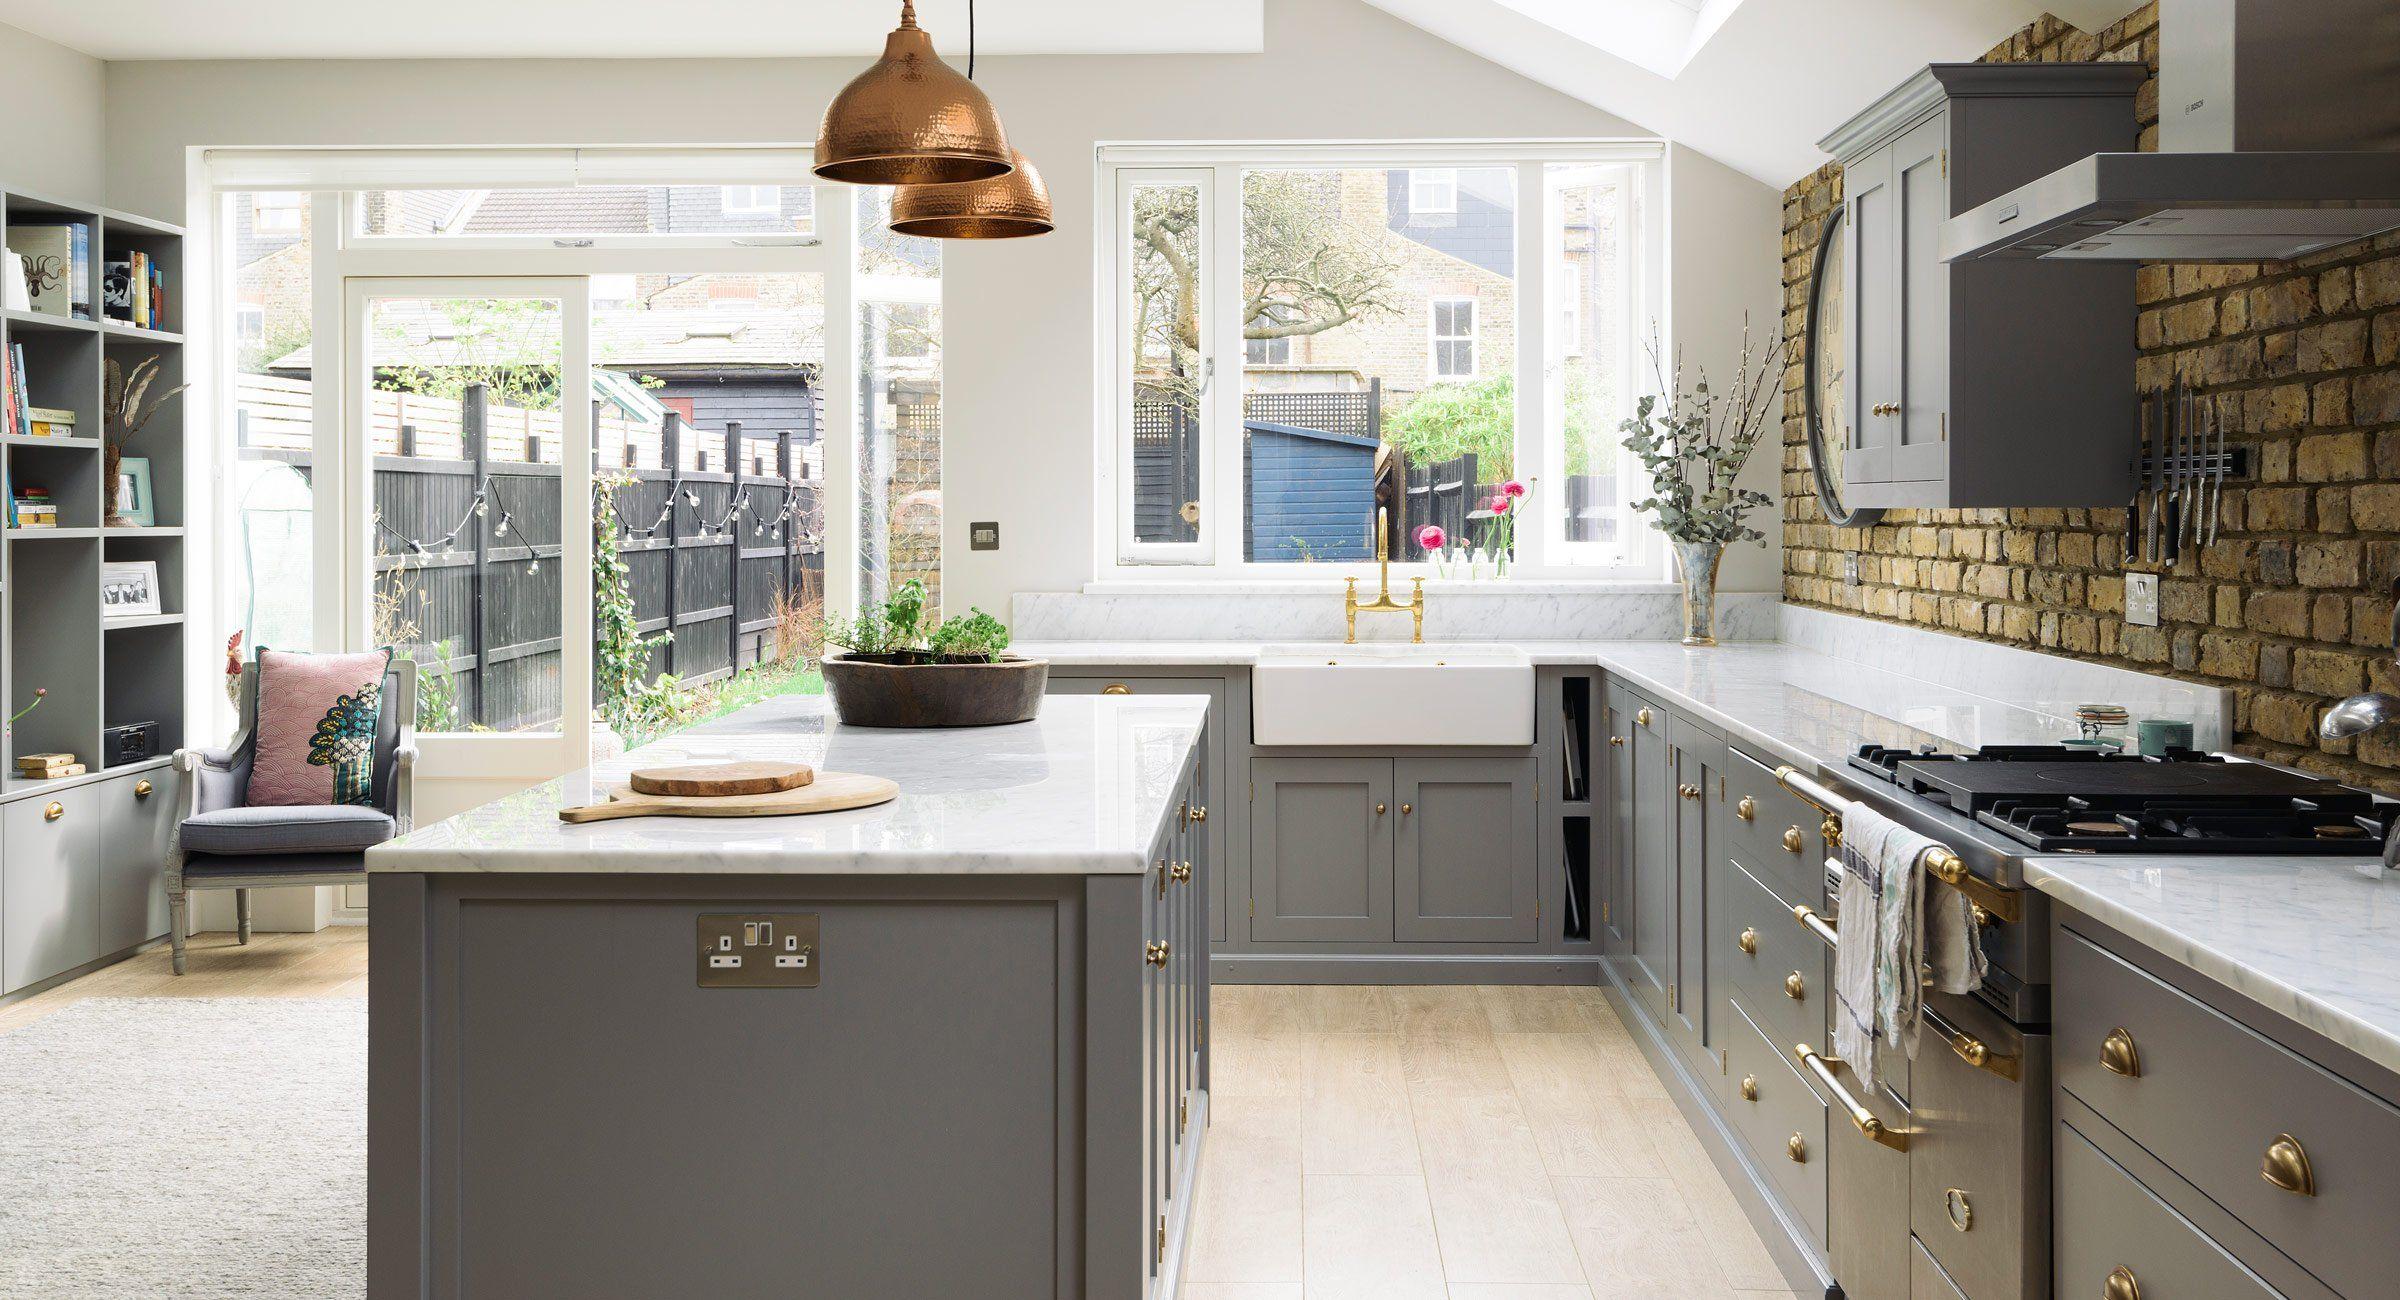 https://www.devolkitchens.co.uk/kitchens/shaker-kitchen/sw12-kitchen